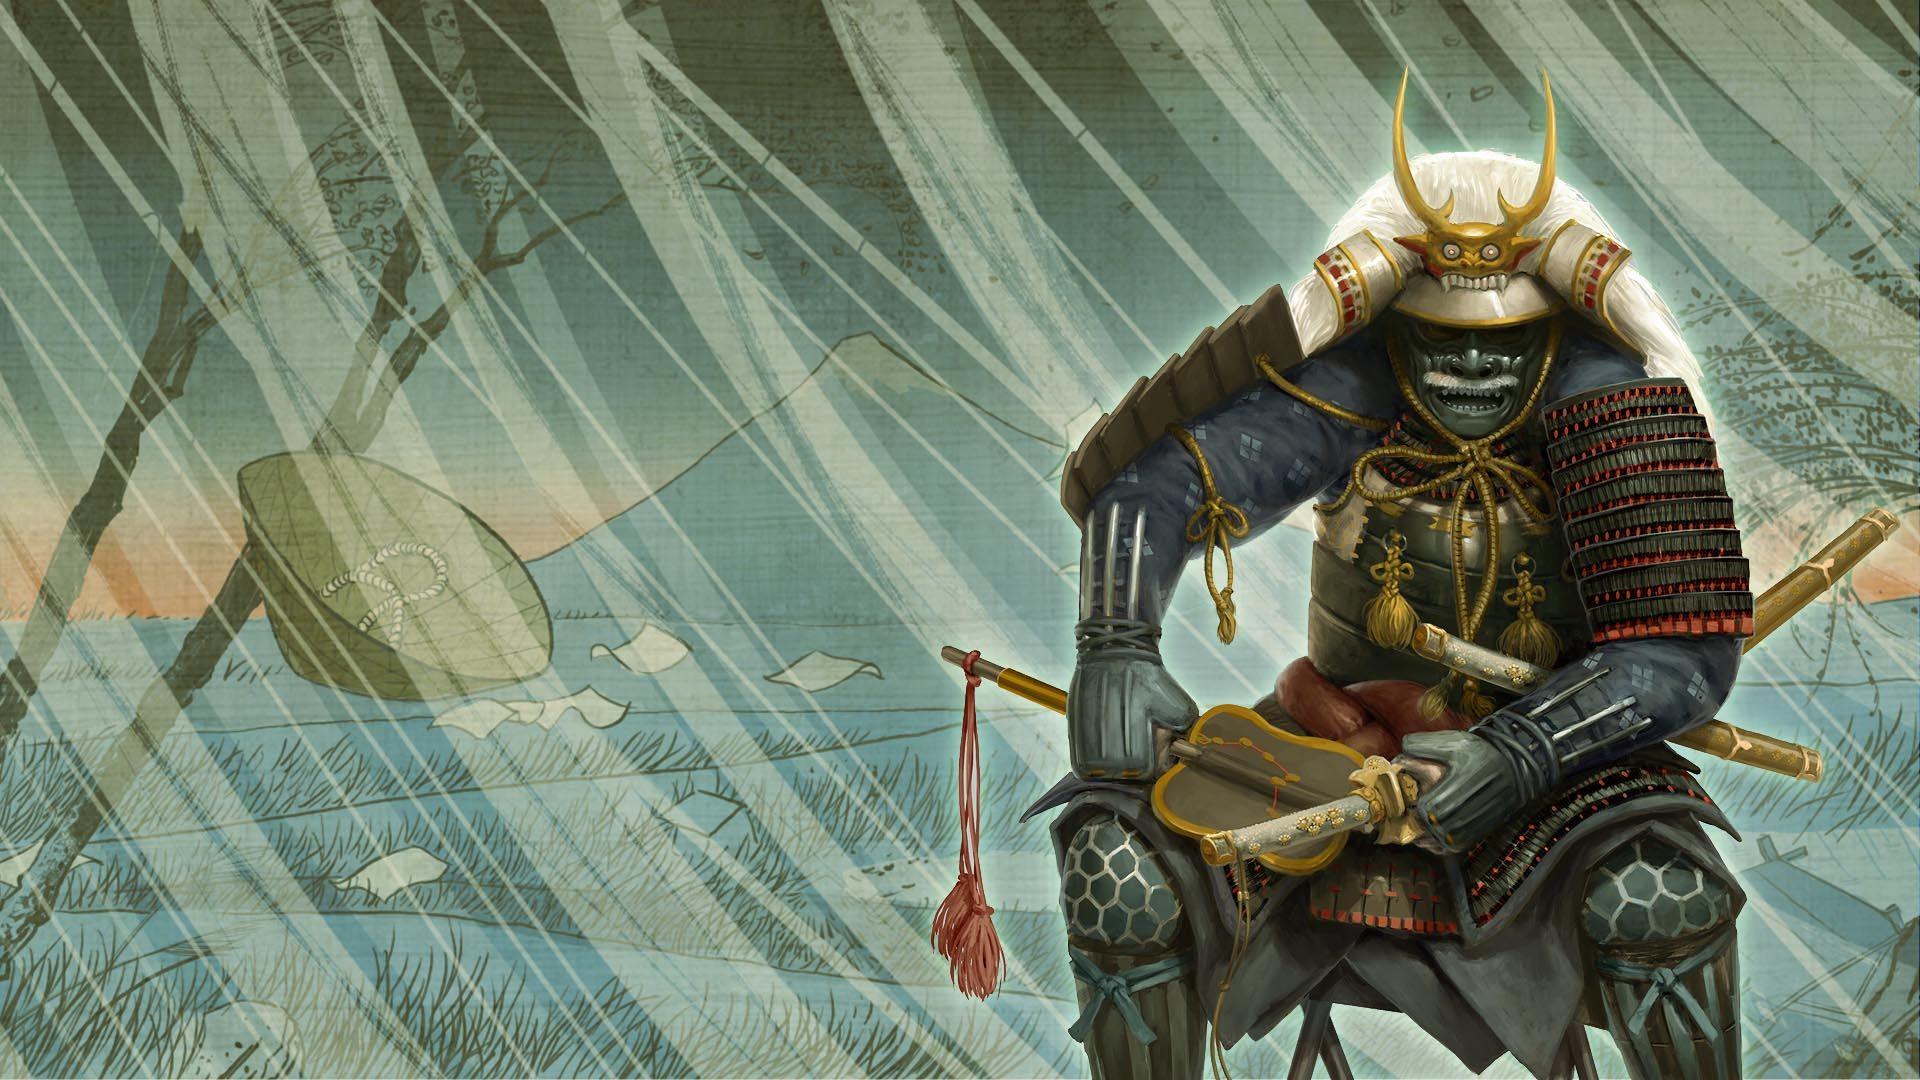 shogun ii: total war wallpaper | epic car wallpapers | pinterest